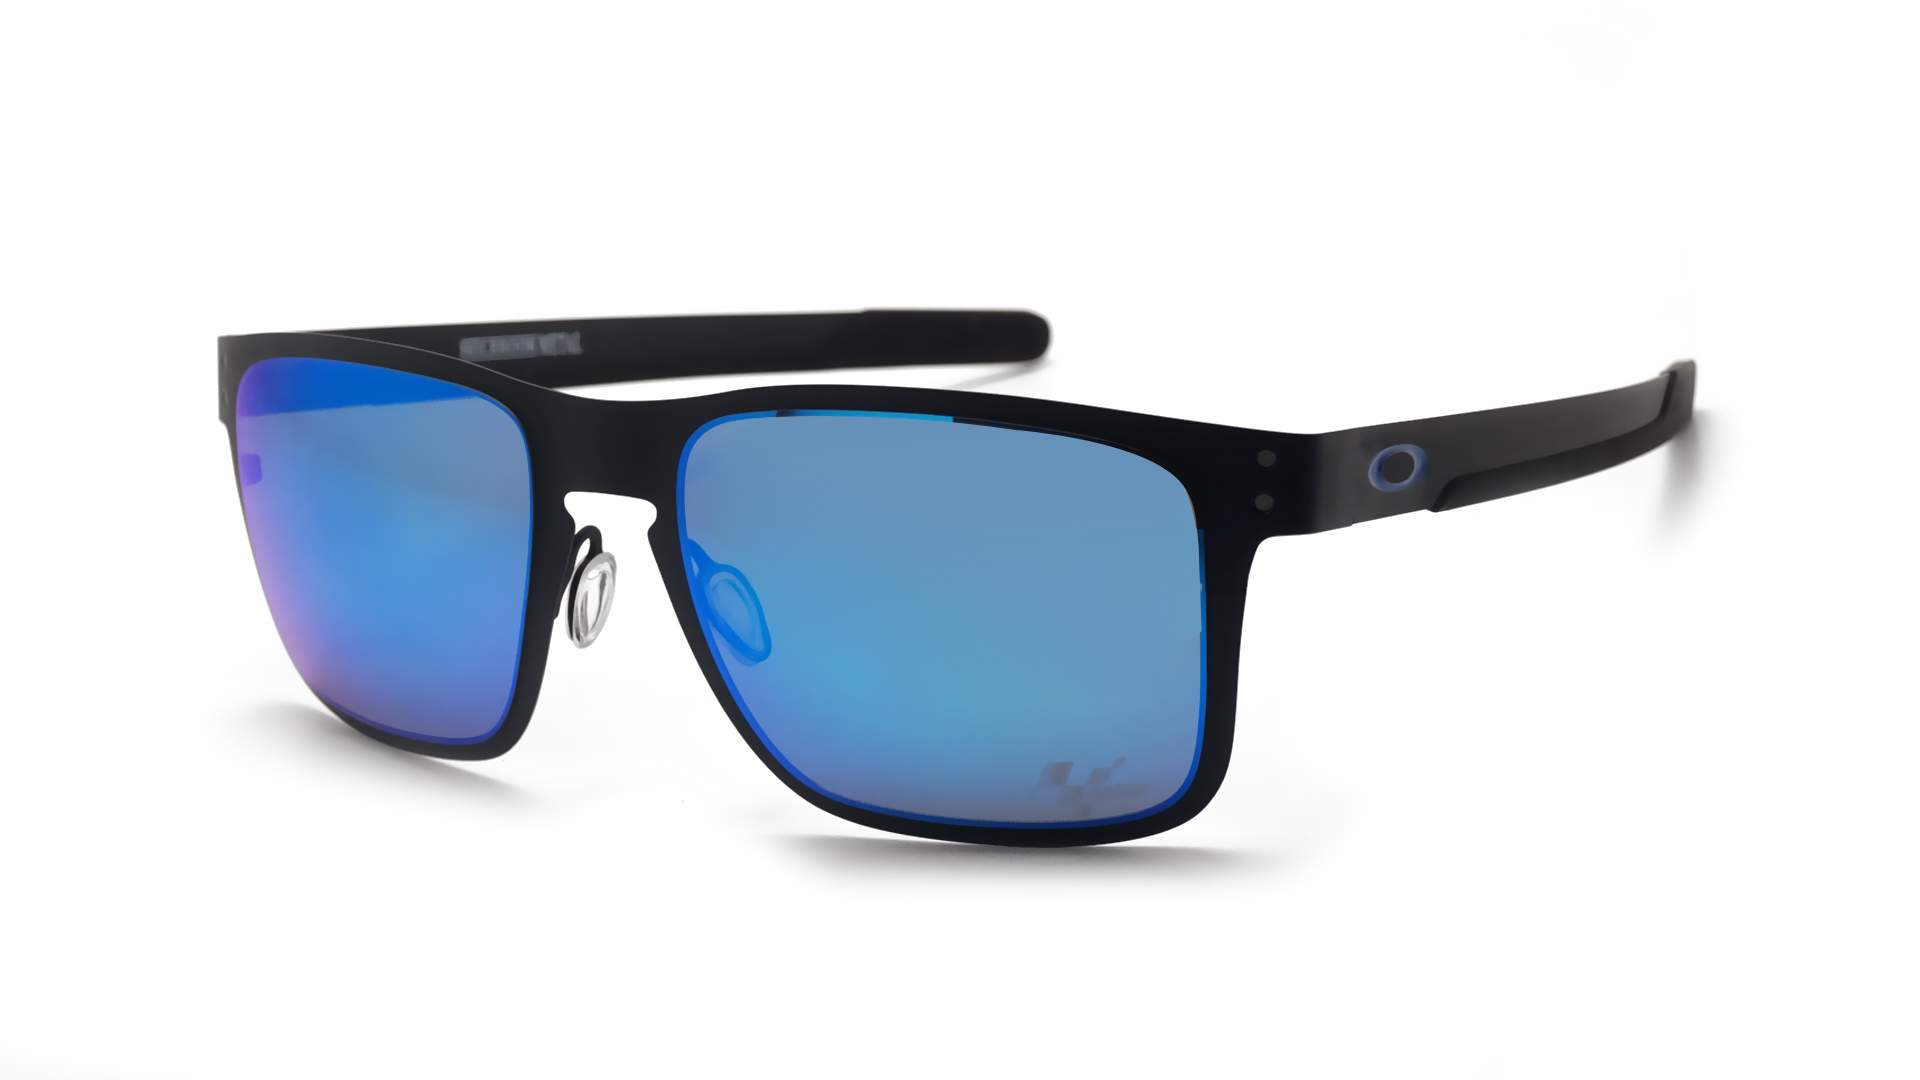 336d044a1e ... promo code for sunglasses oakley holbrook metal motogp black matte  prizm oo4123 10 55 18 medium